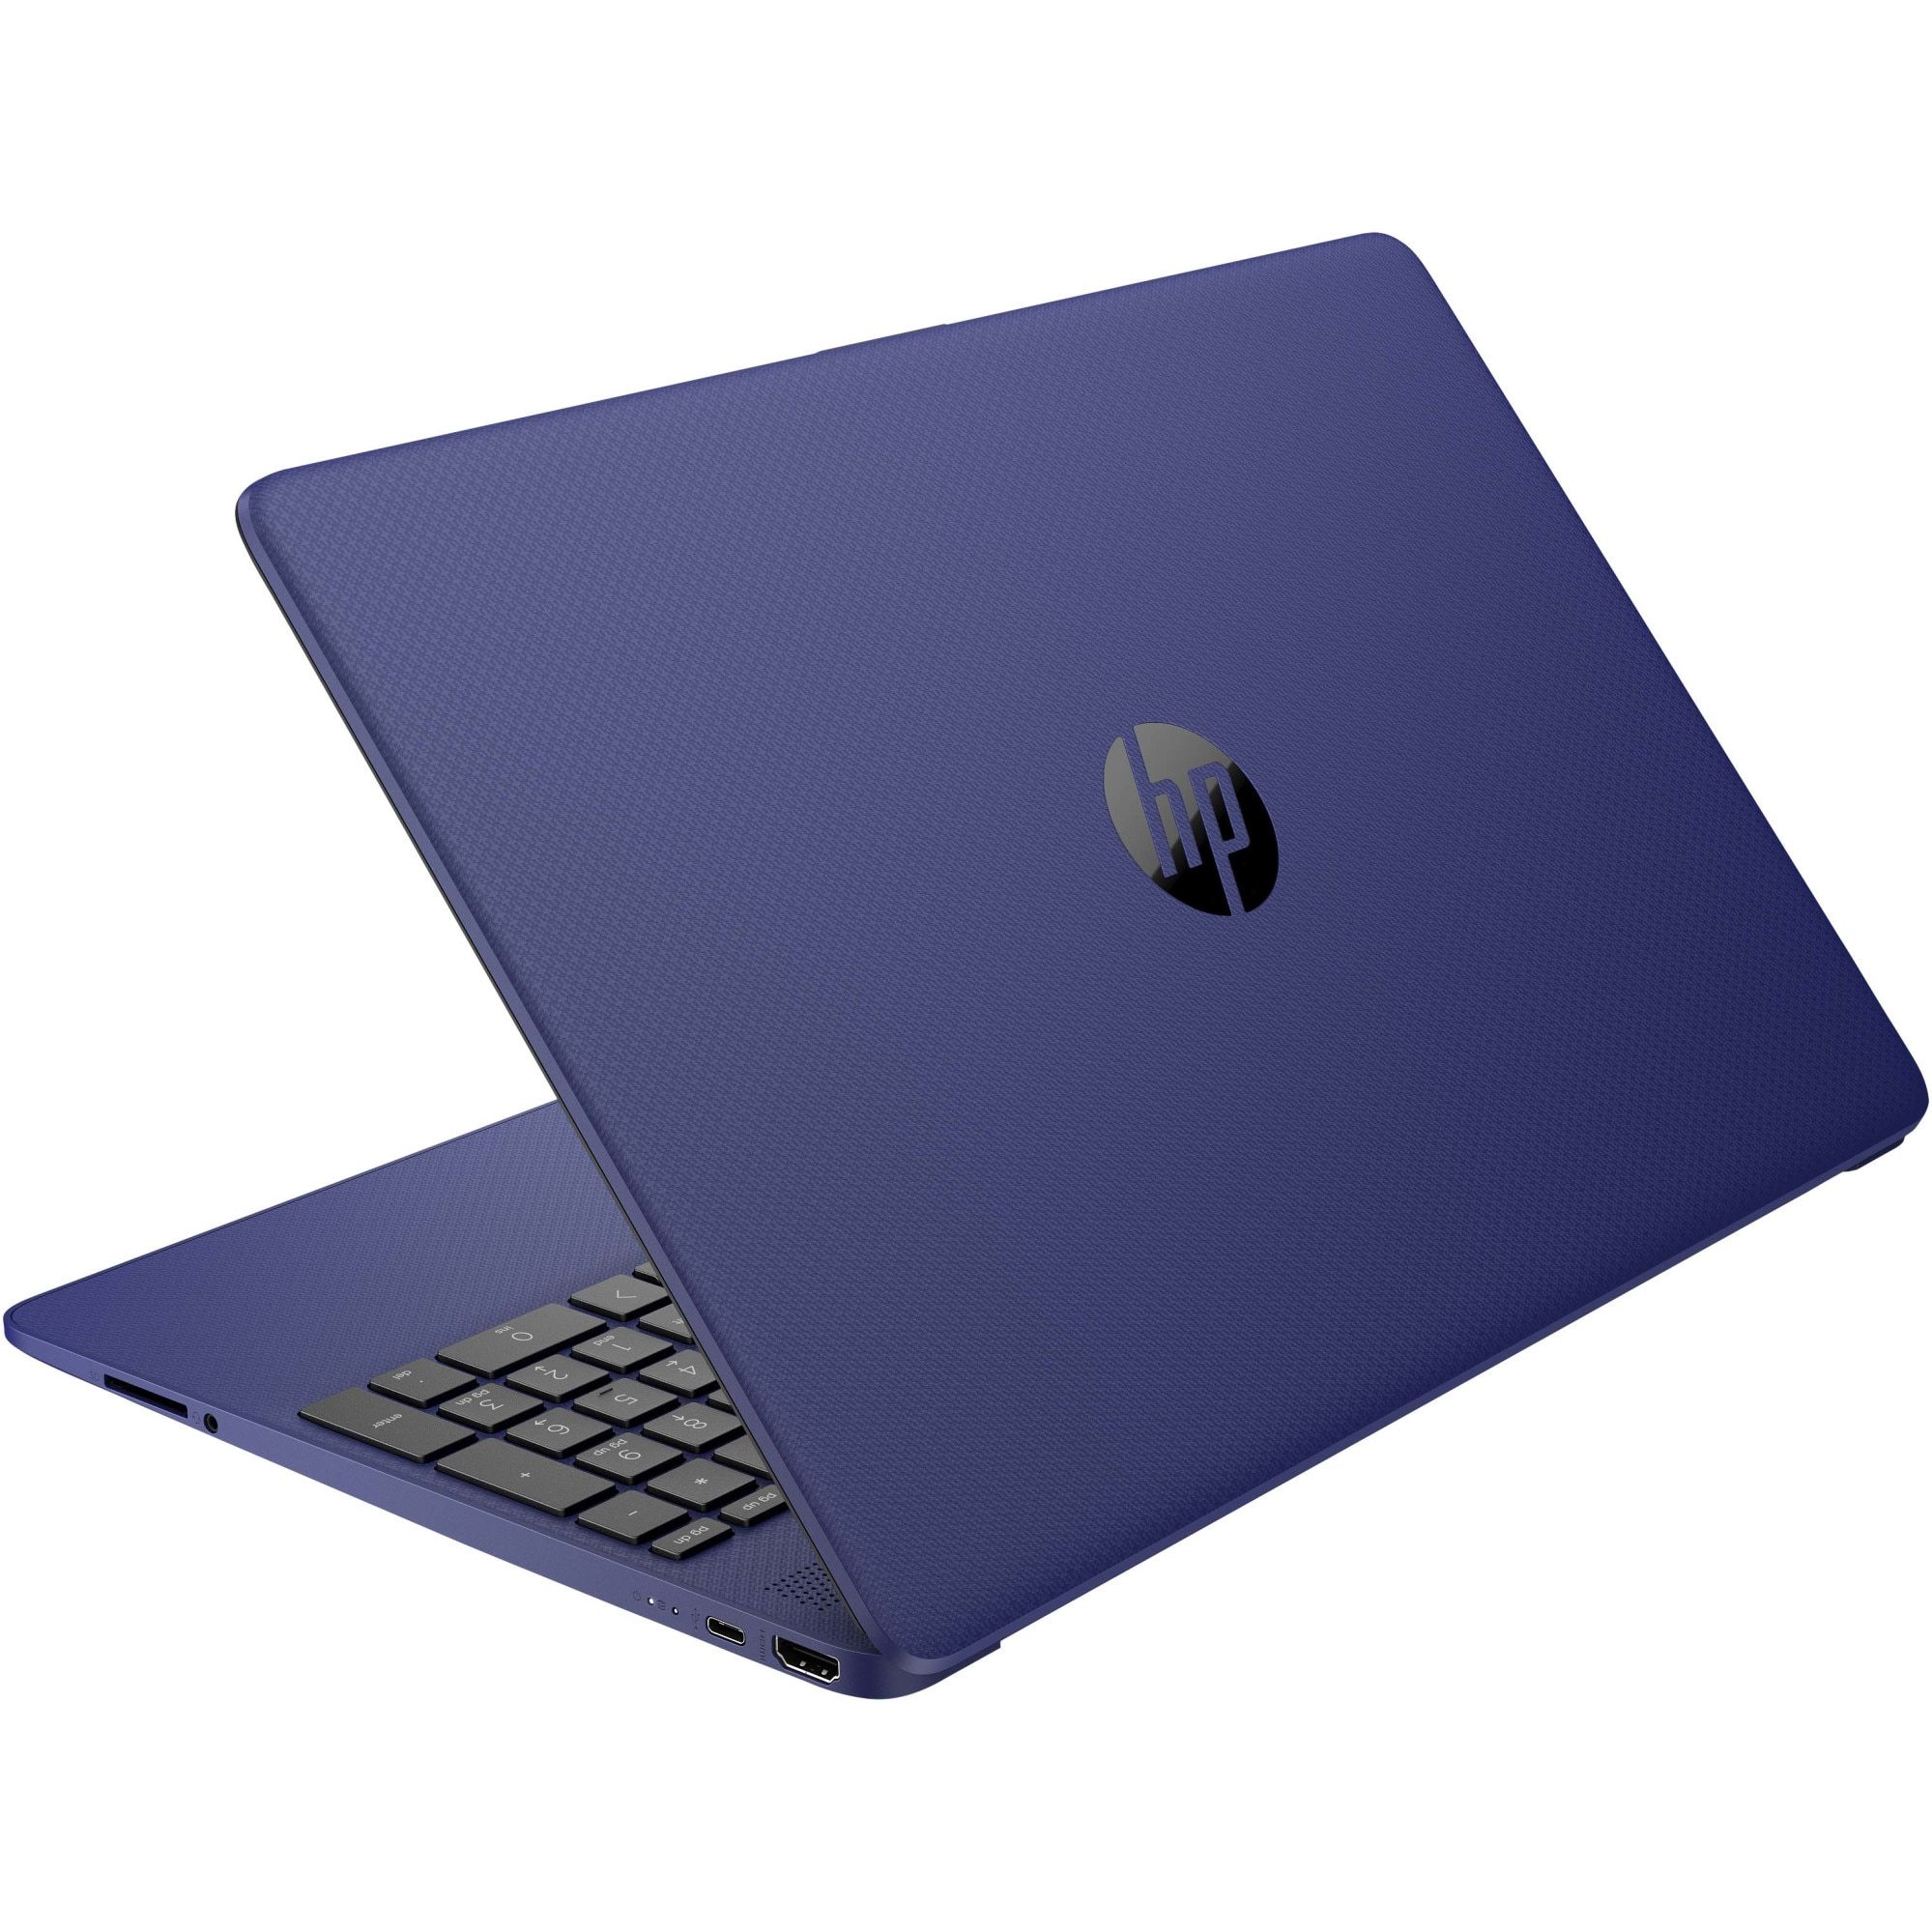 "Лаптоп HP 15s-eq0081nq, 15.6"", AMD Ryzen™ 7 3700U, RAM 8GB, SSD 256GB, AMD Radeon™ RX Vega 10, Free DOS, Indigo Blue - eMAG.bg"